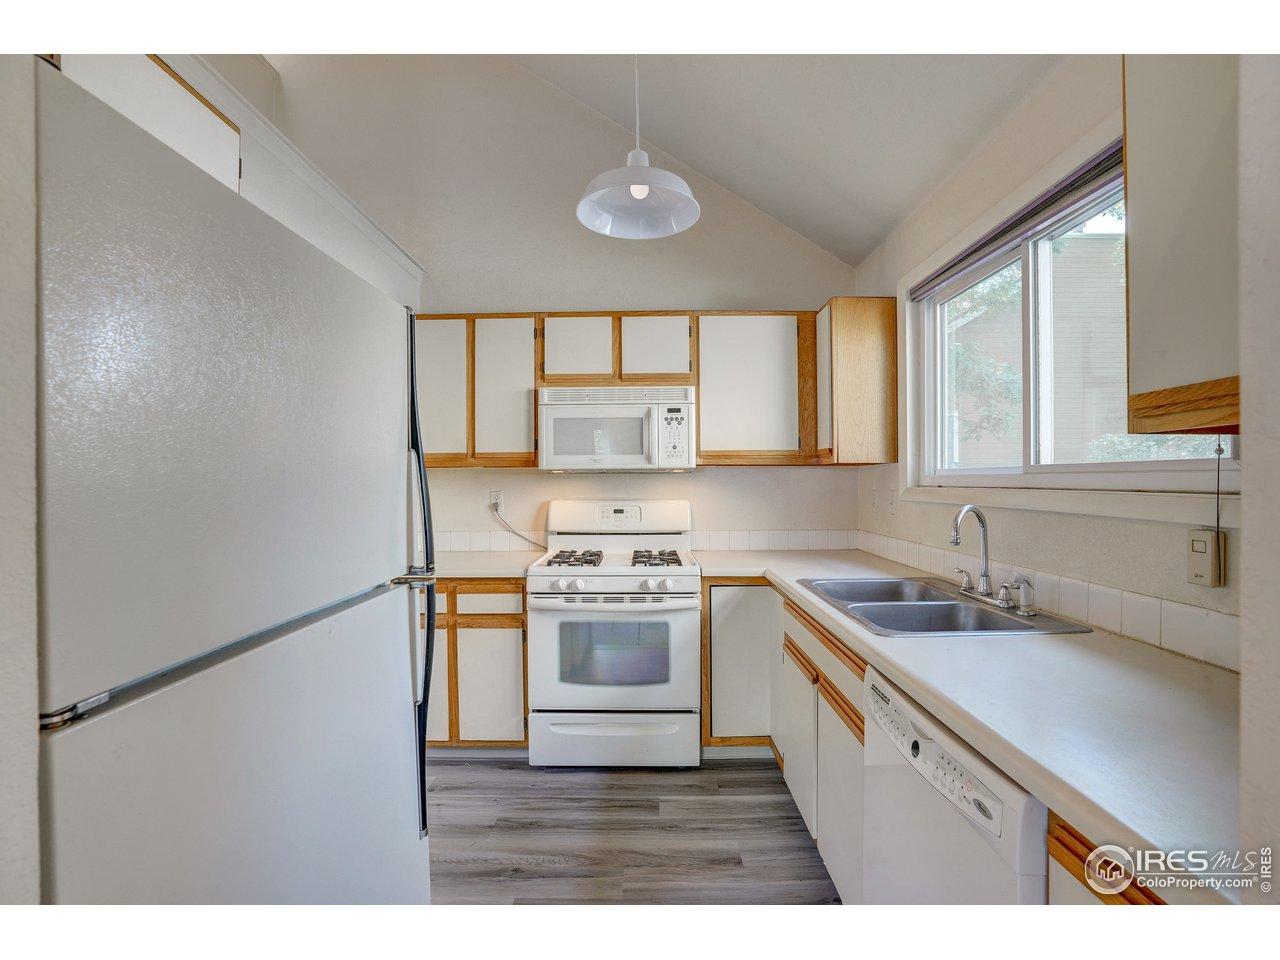 Kitchen has new flooring